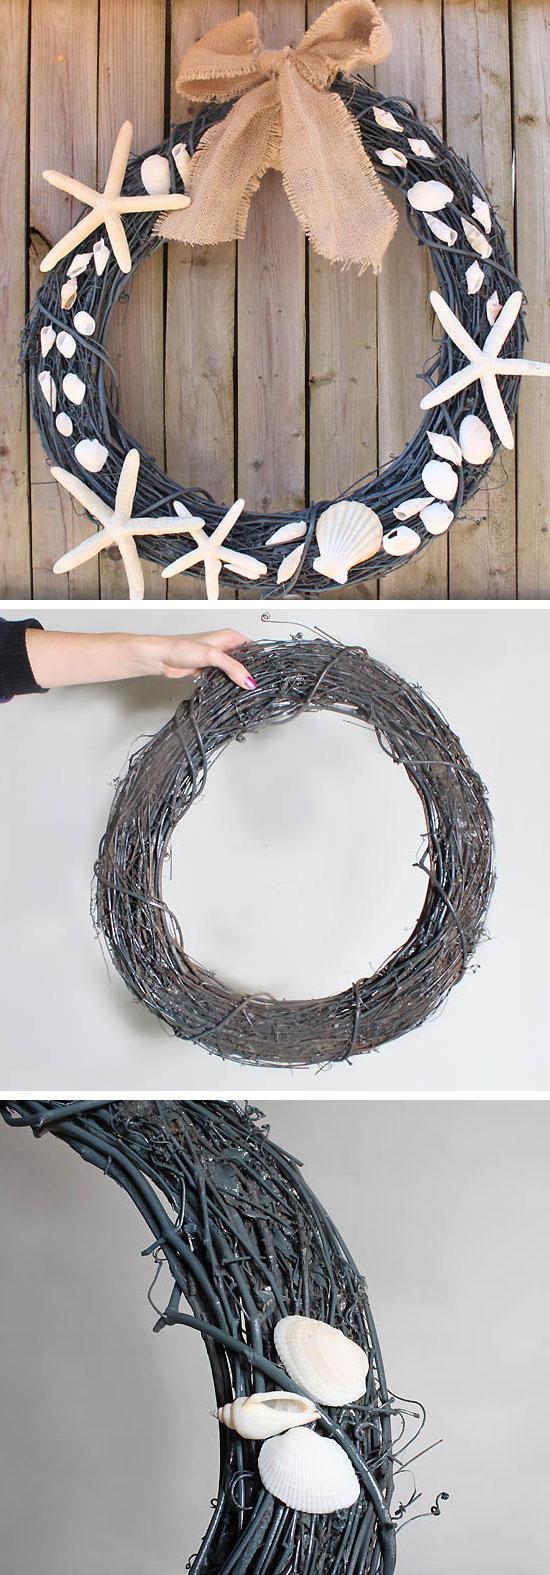 DIY Pottery Barn Shell Wreath.